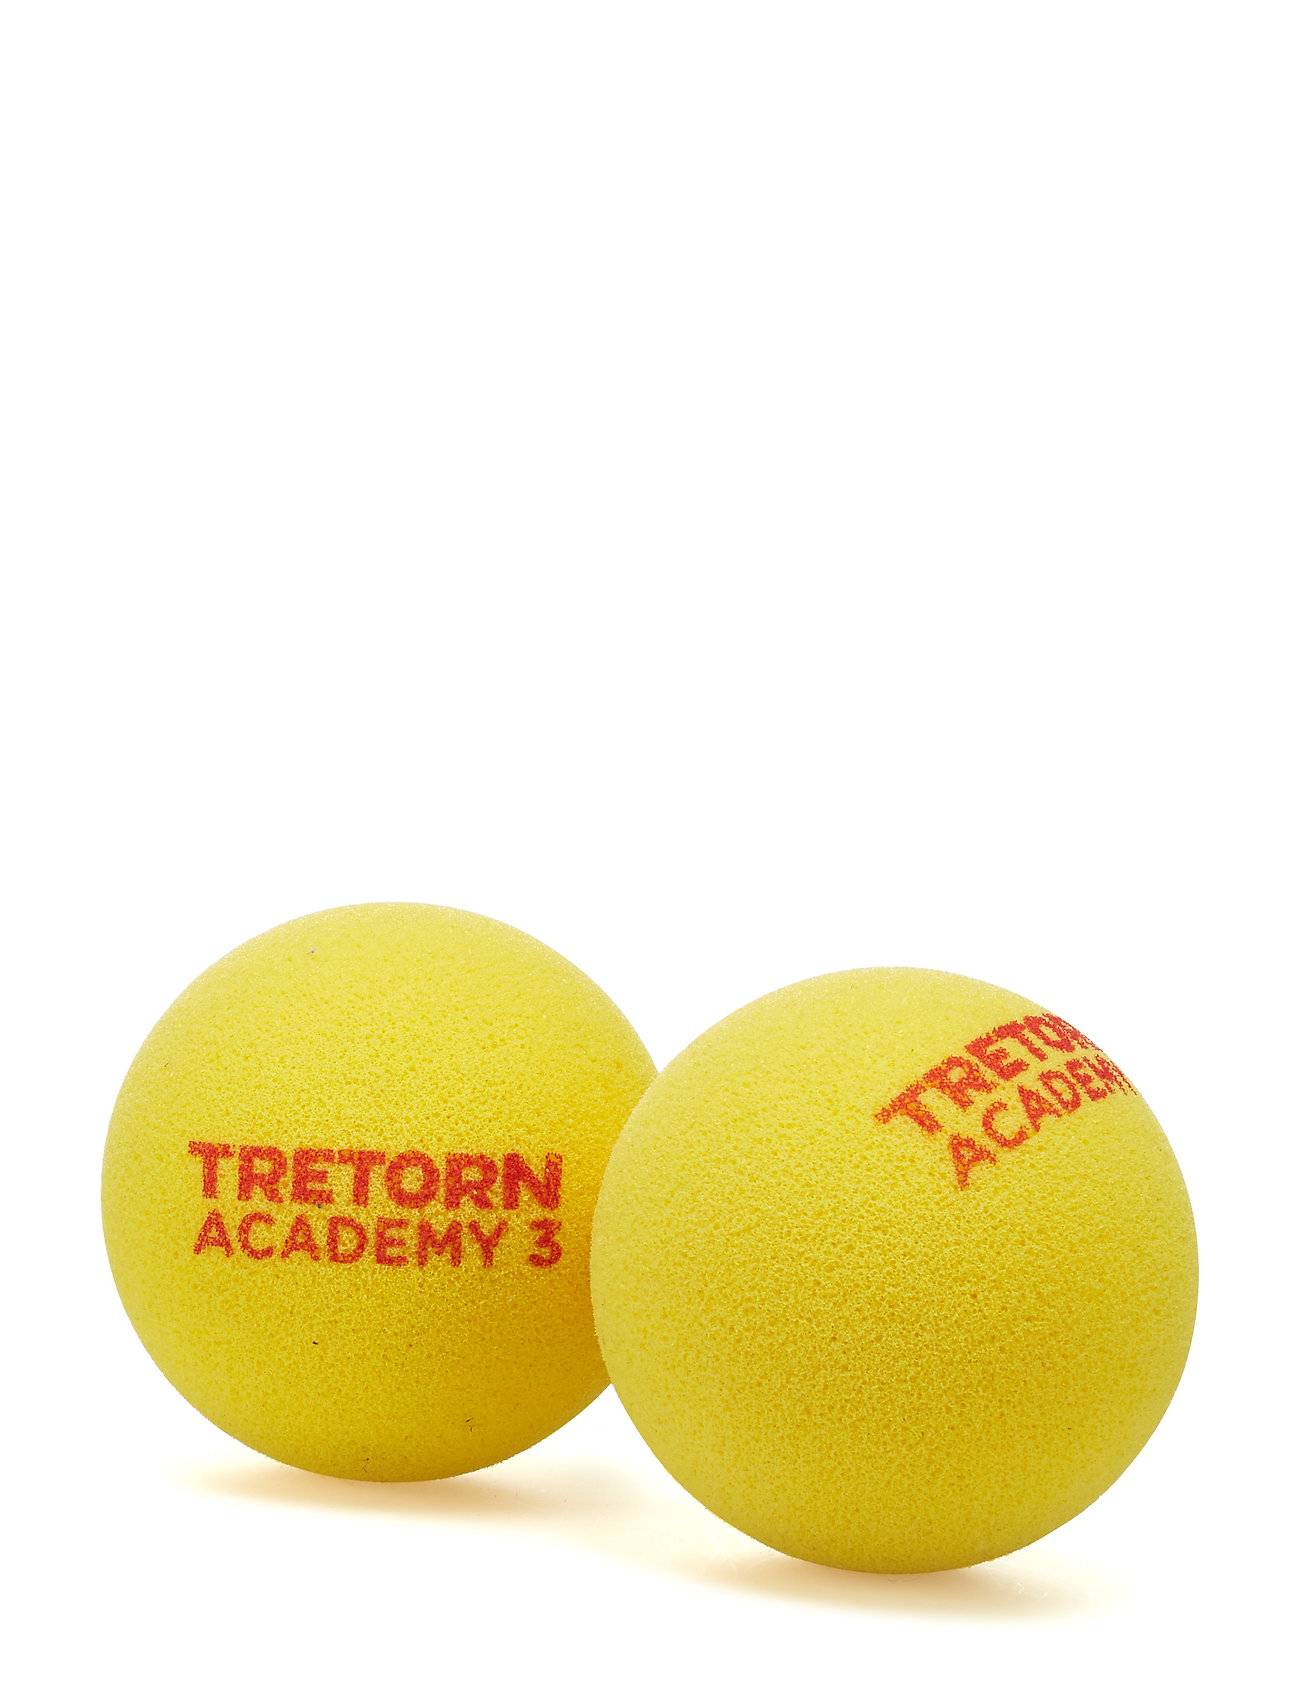 Tretorn Academy Red Foam 2 Pack